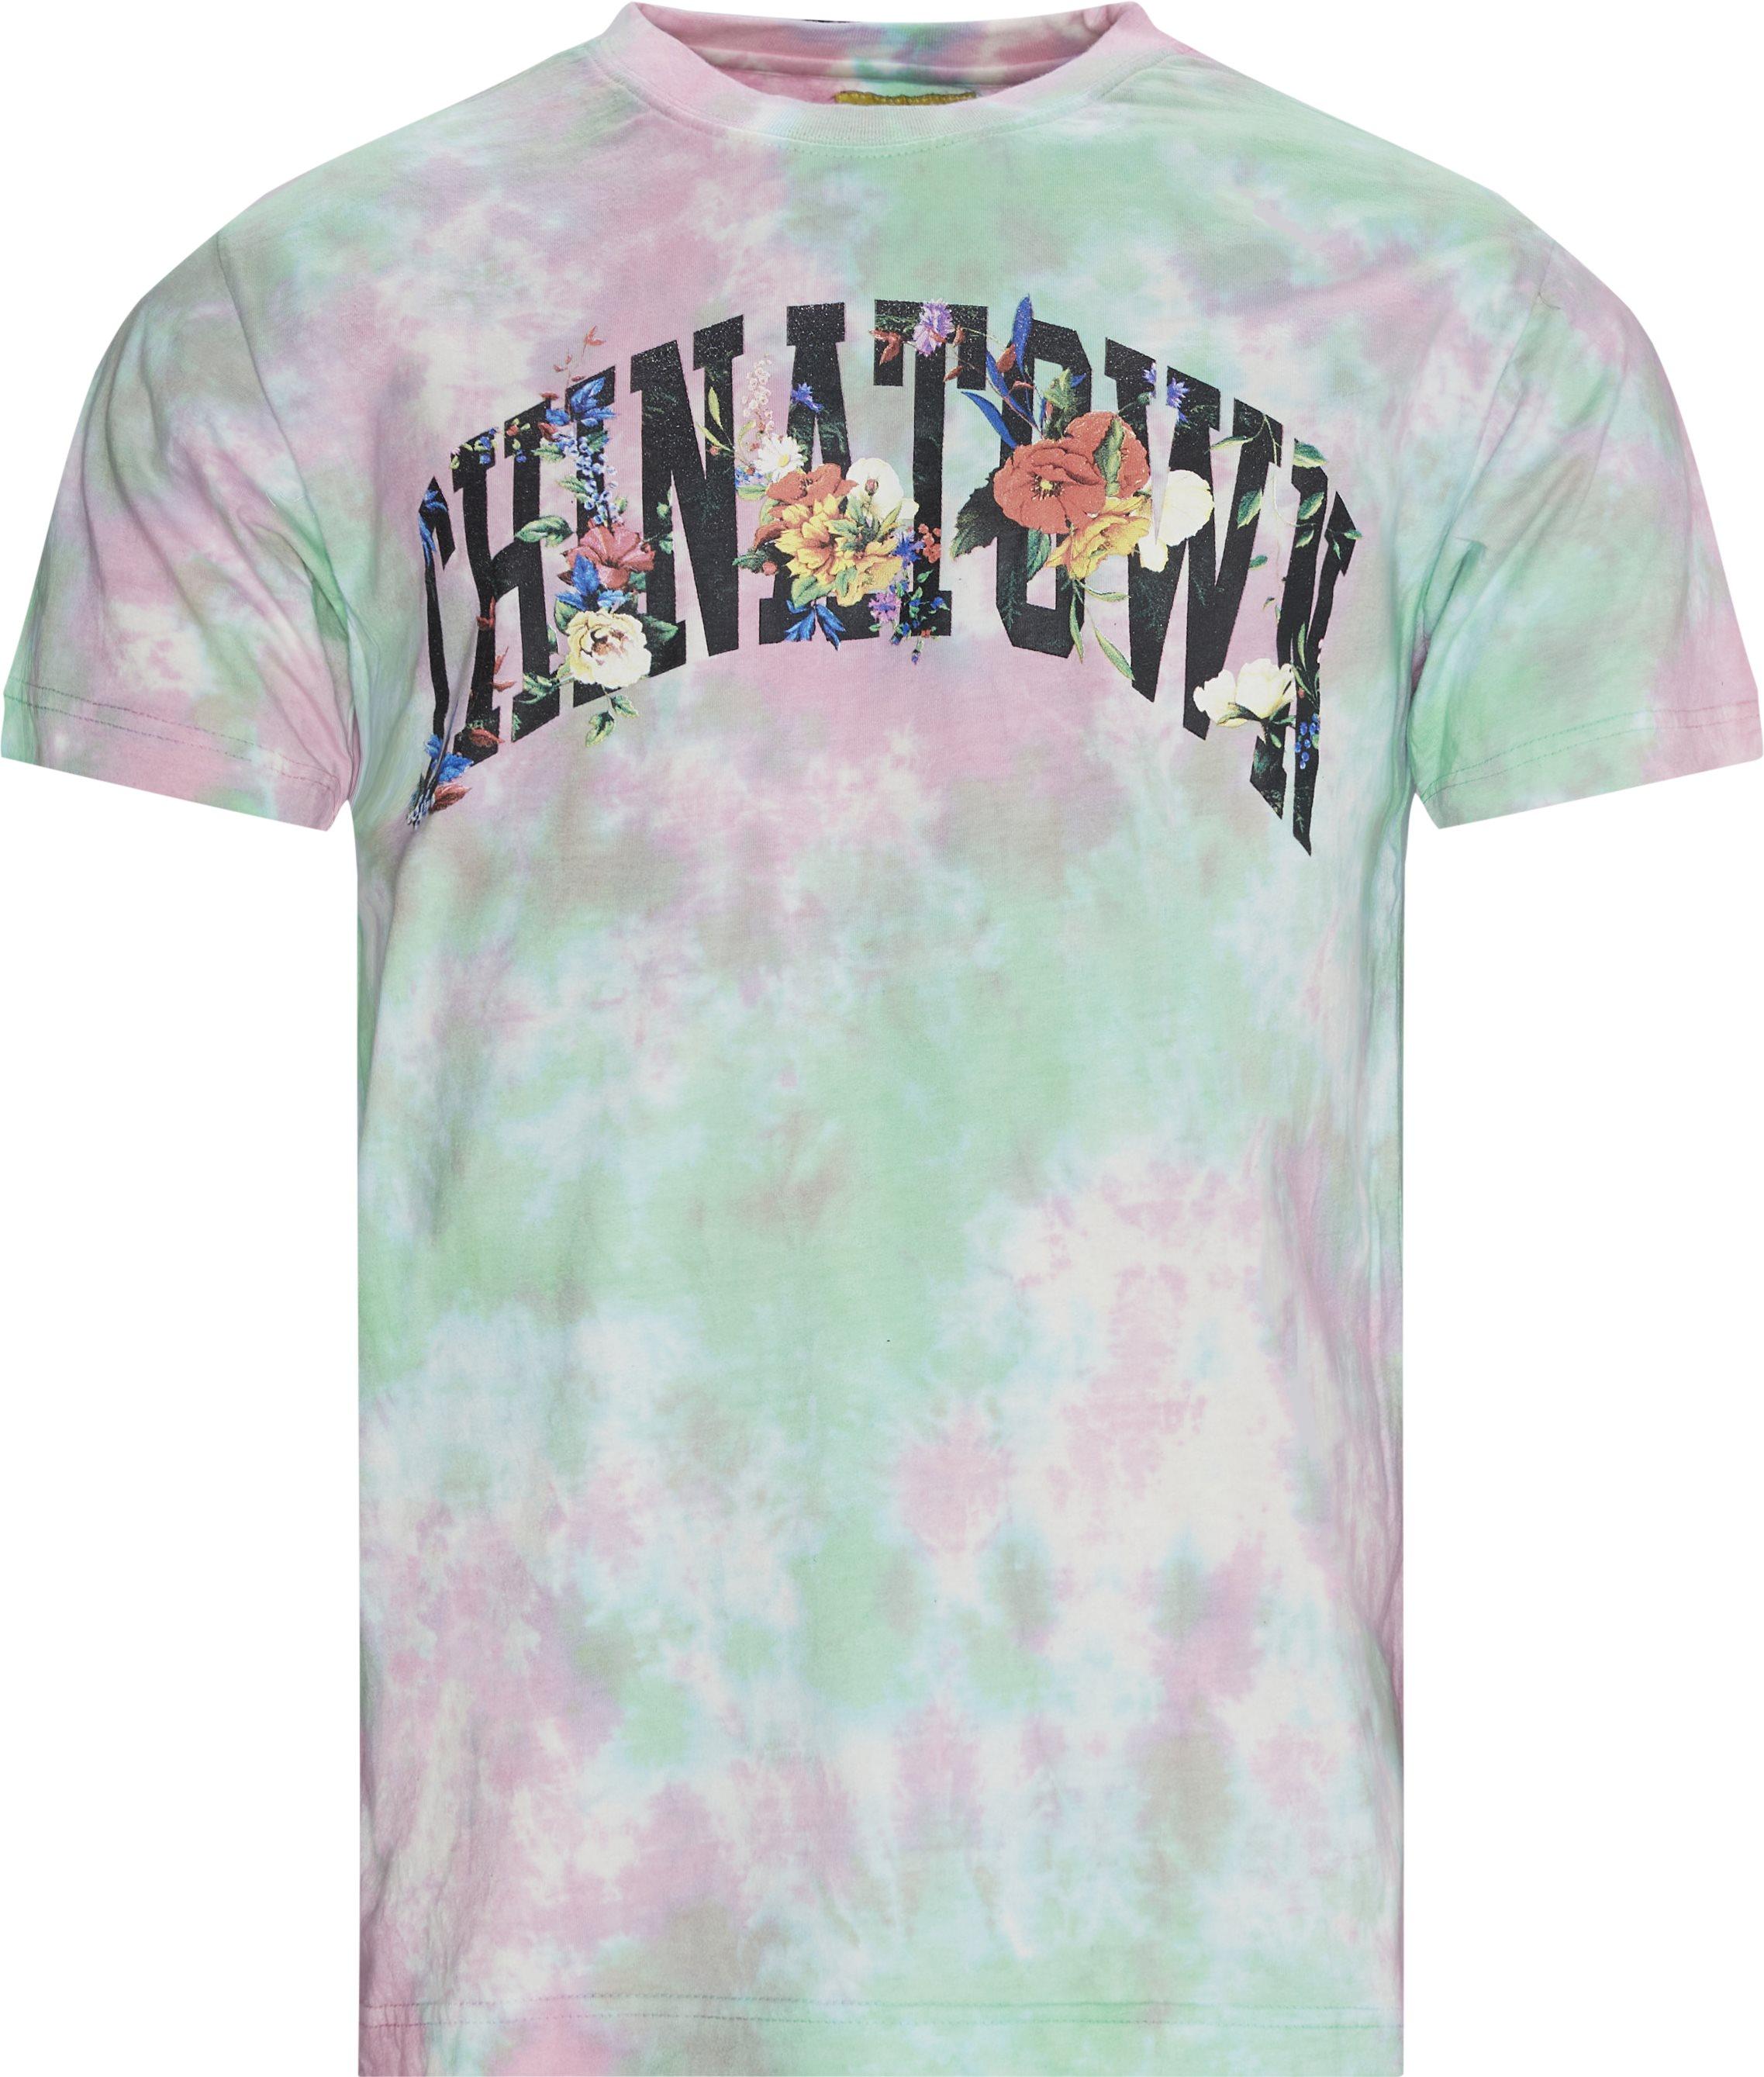 Flower Arc Tee - T-shirts - Regular fit - Multi